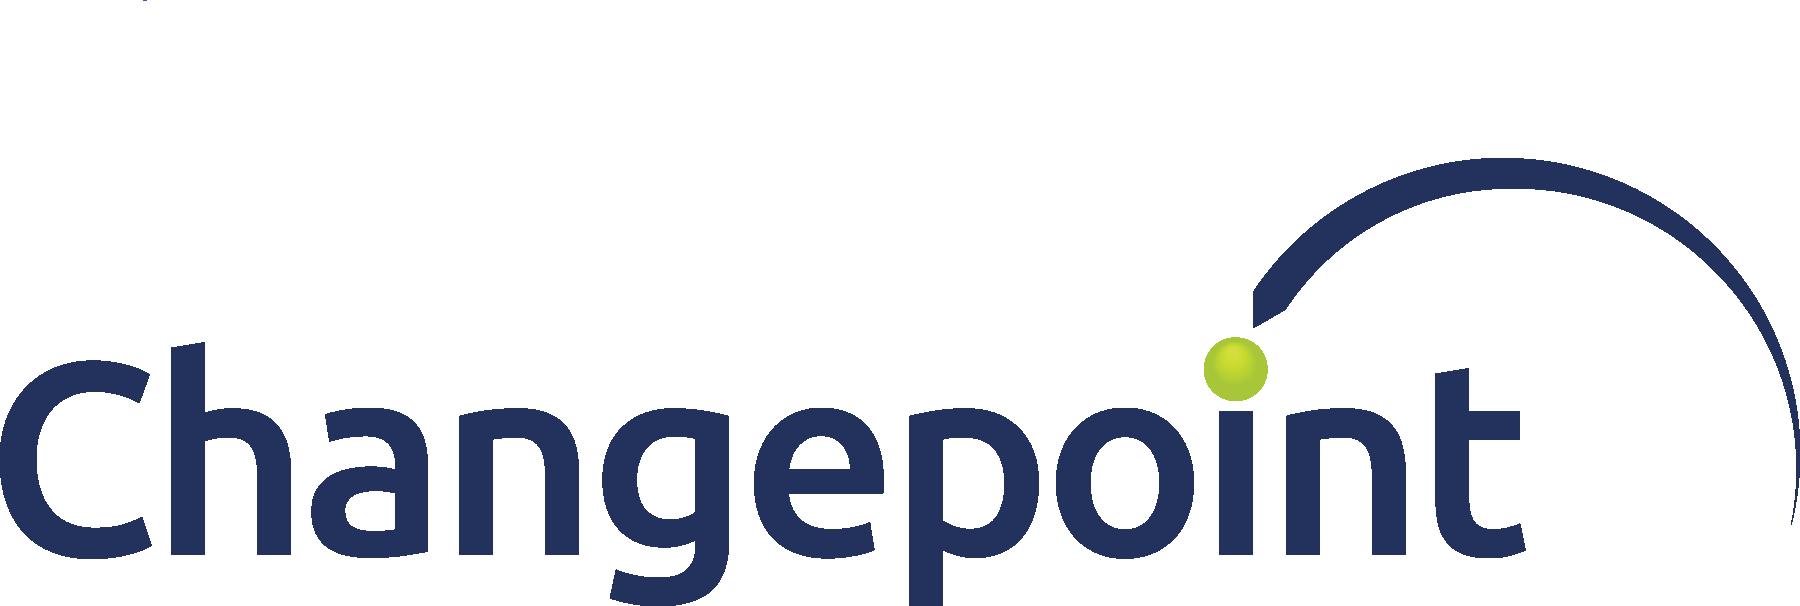 Changepoint Project Portfolio Management logo